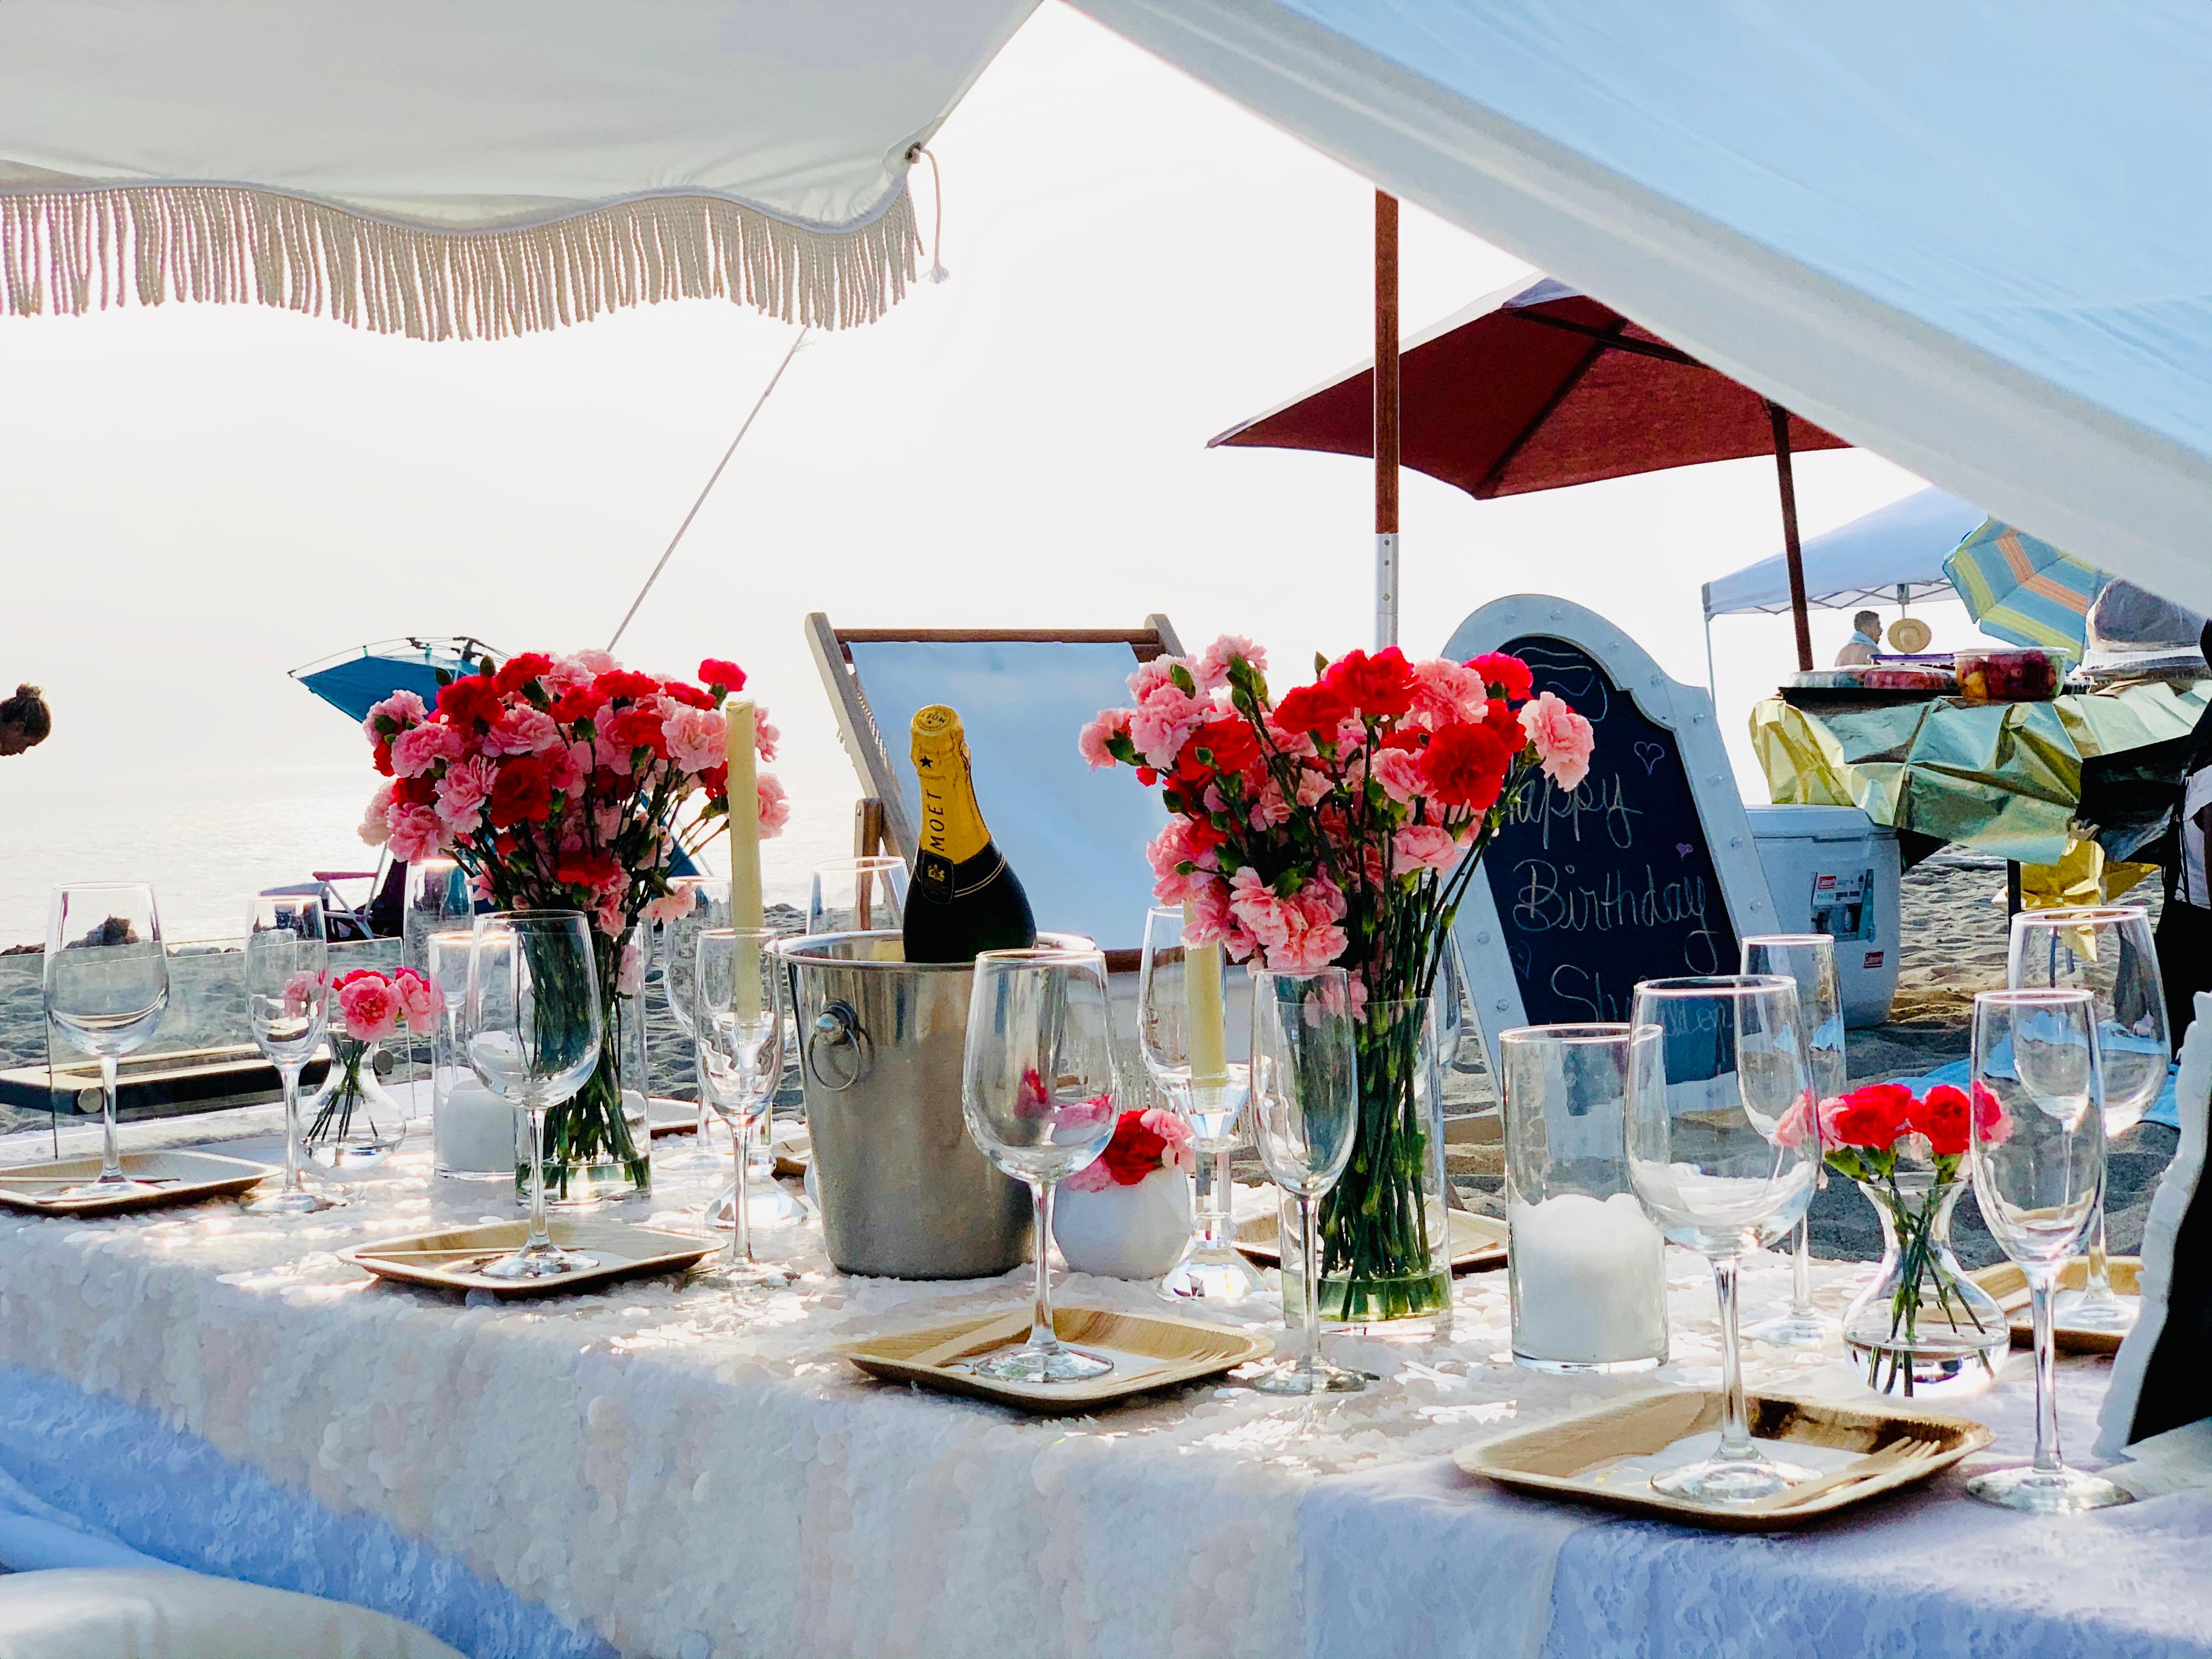 Luxury Fringe Tent Pop-Up for Six